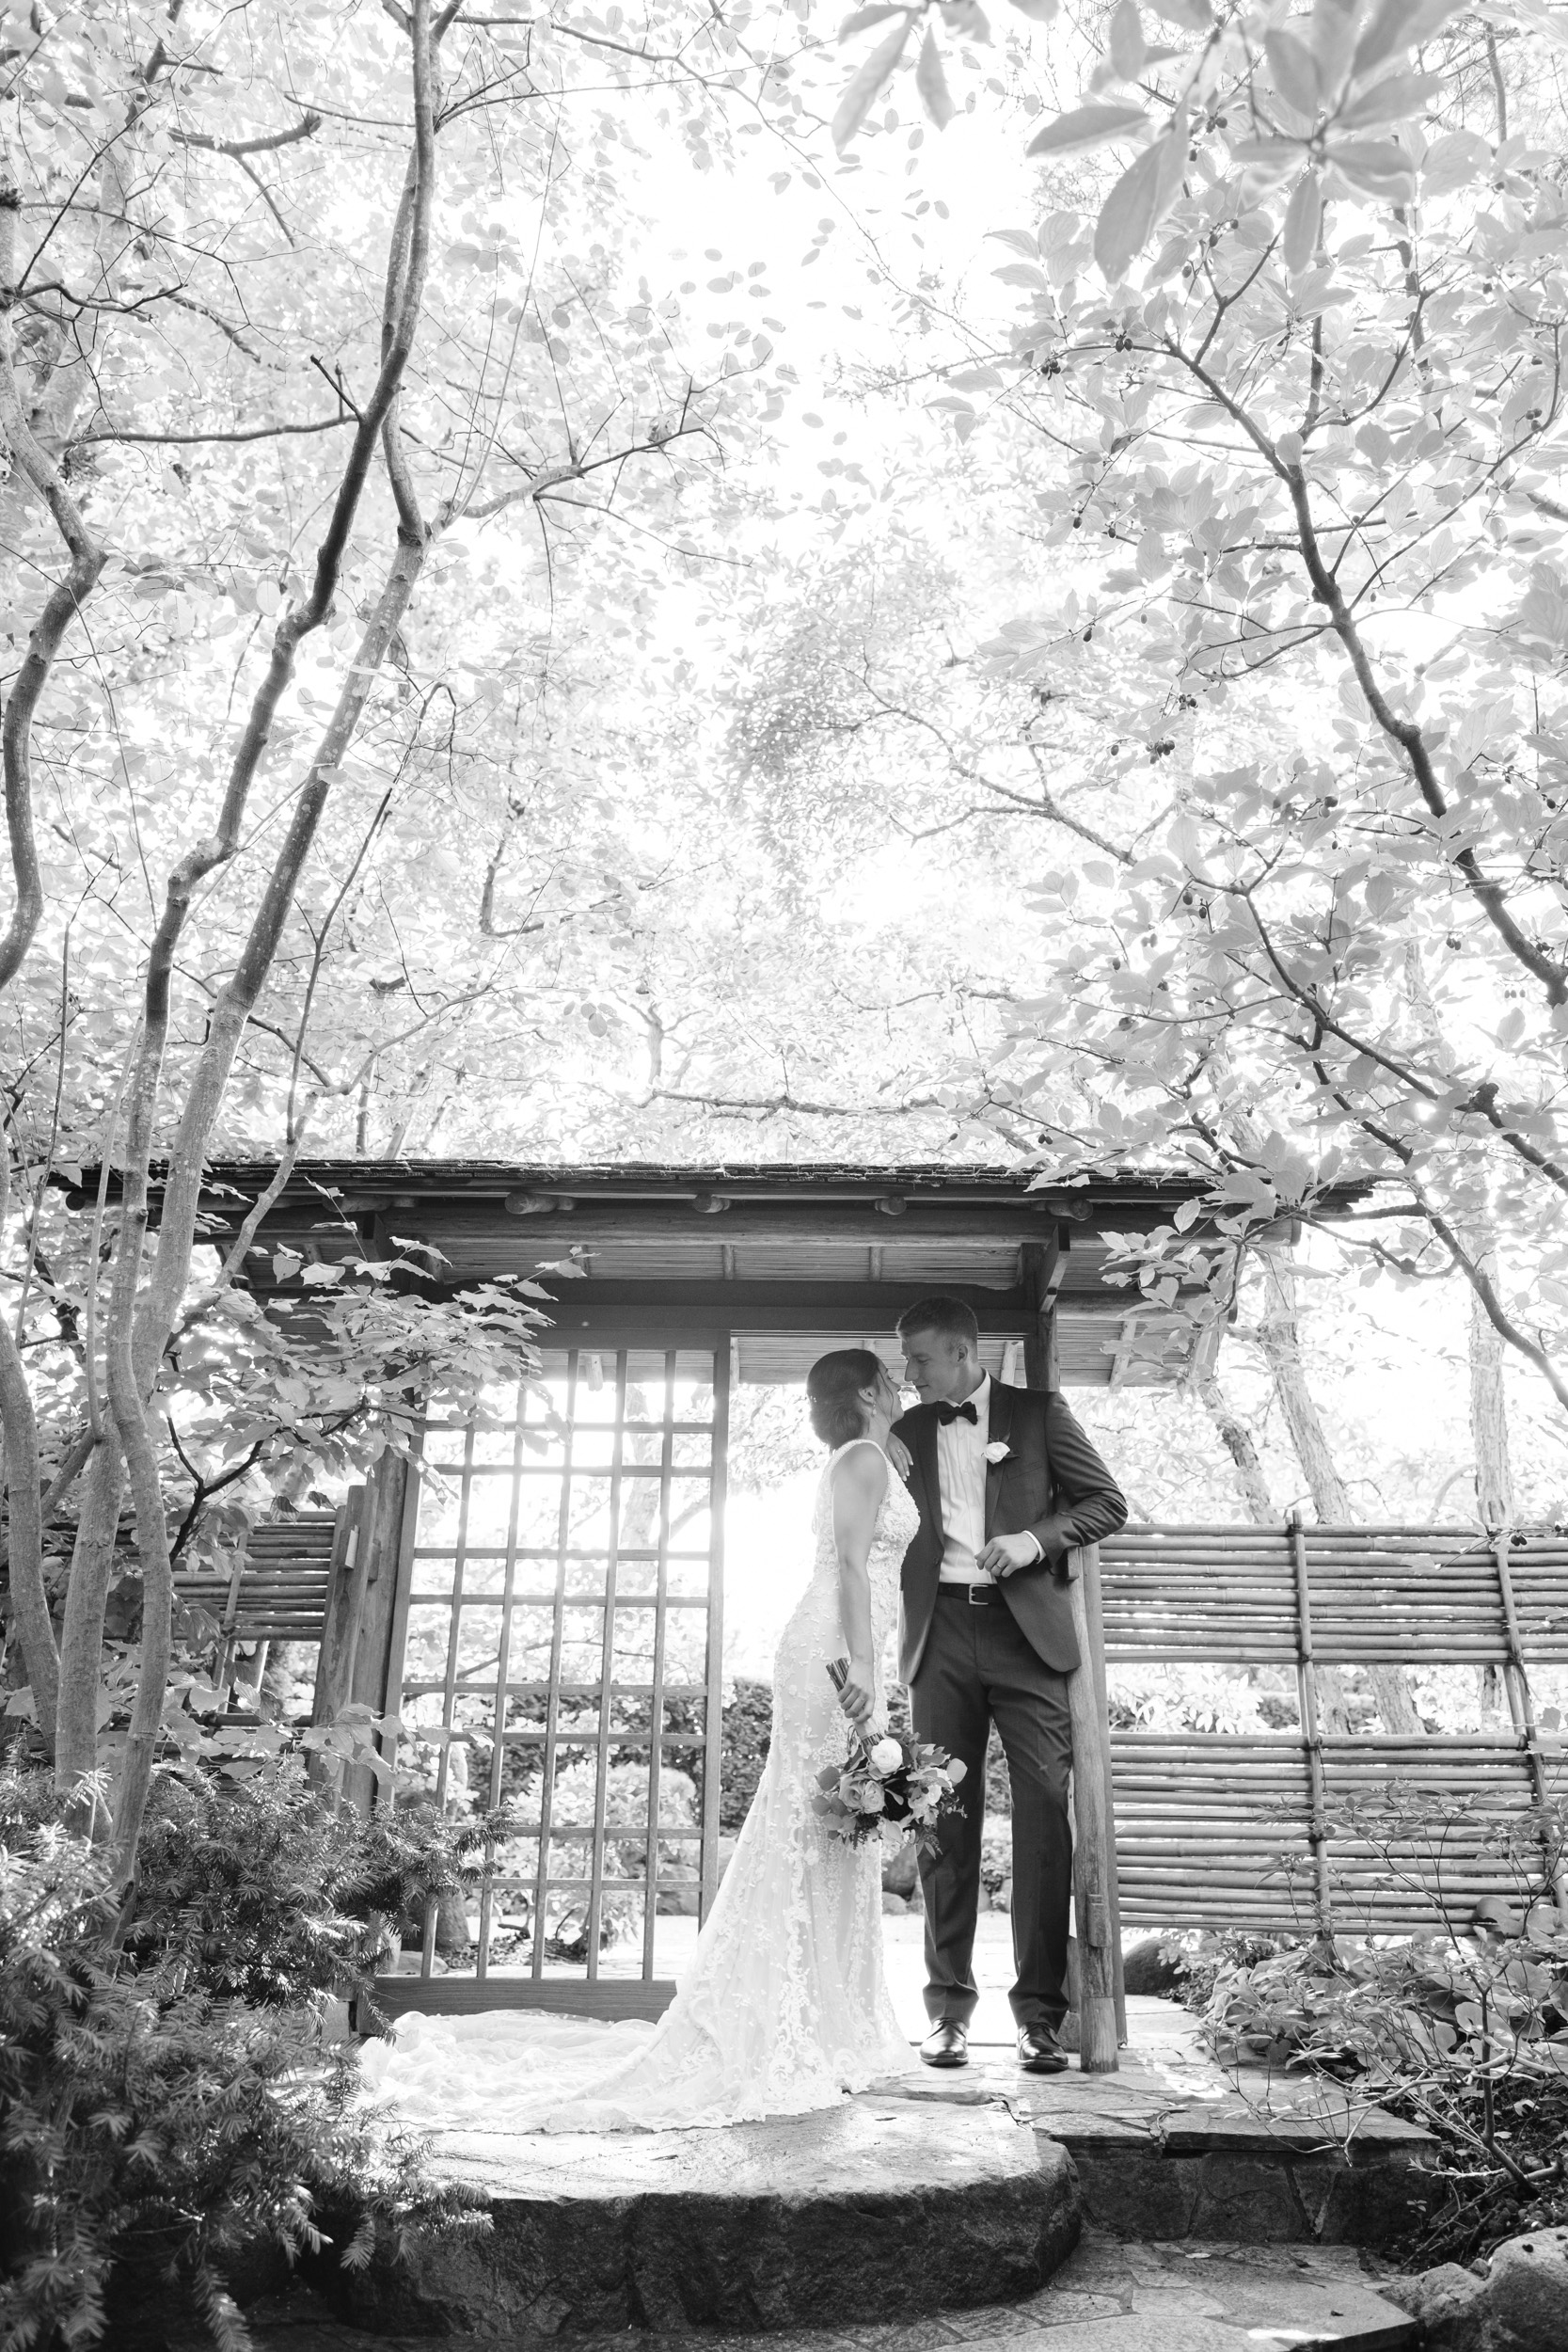 18-09-01 BAP Kiley-Trevor-Anderson-Gardens-Wedding-60.jpg